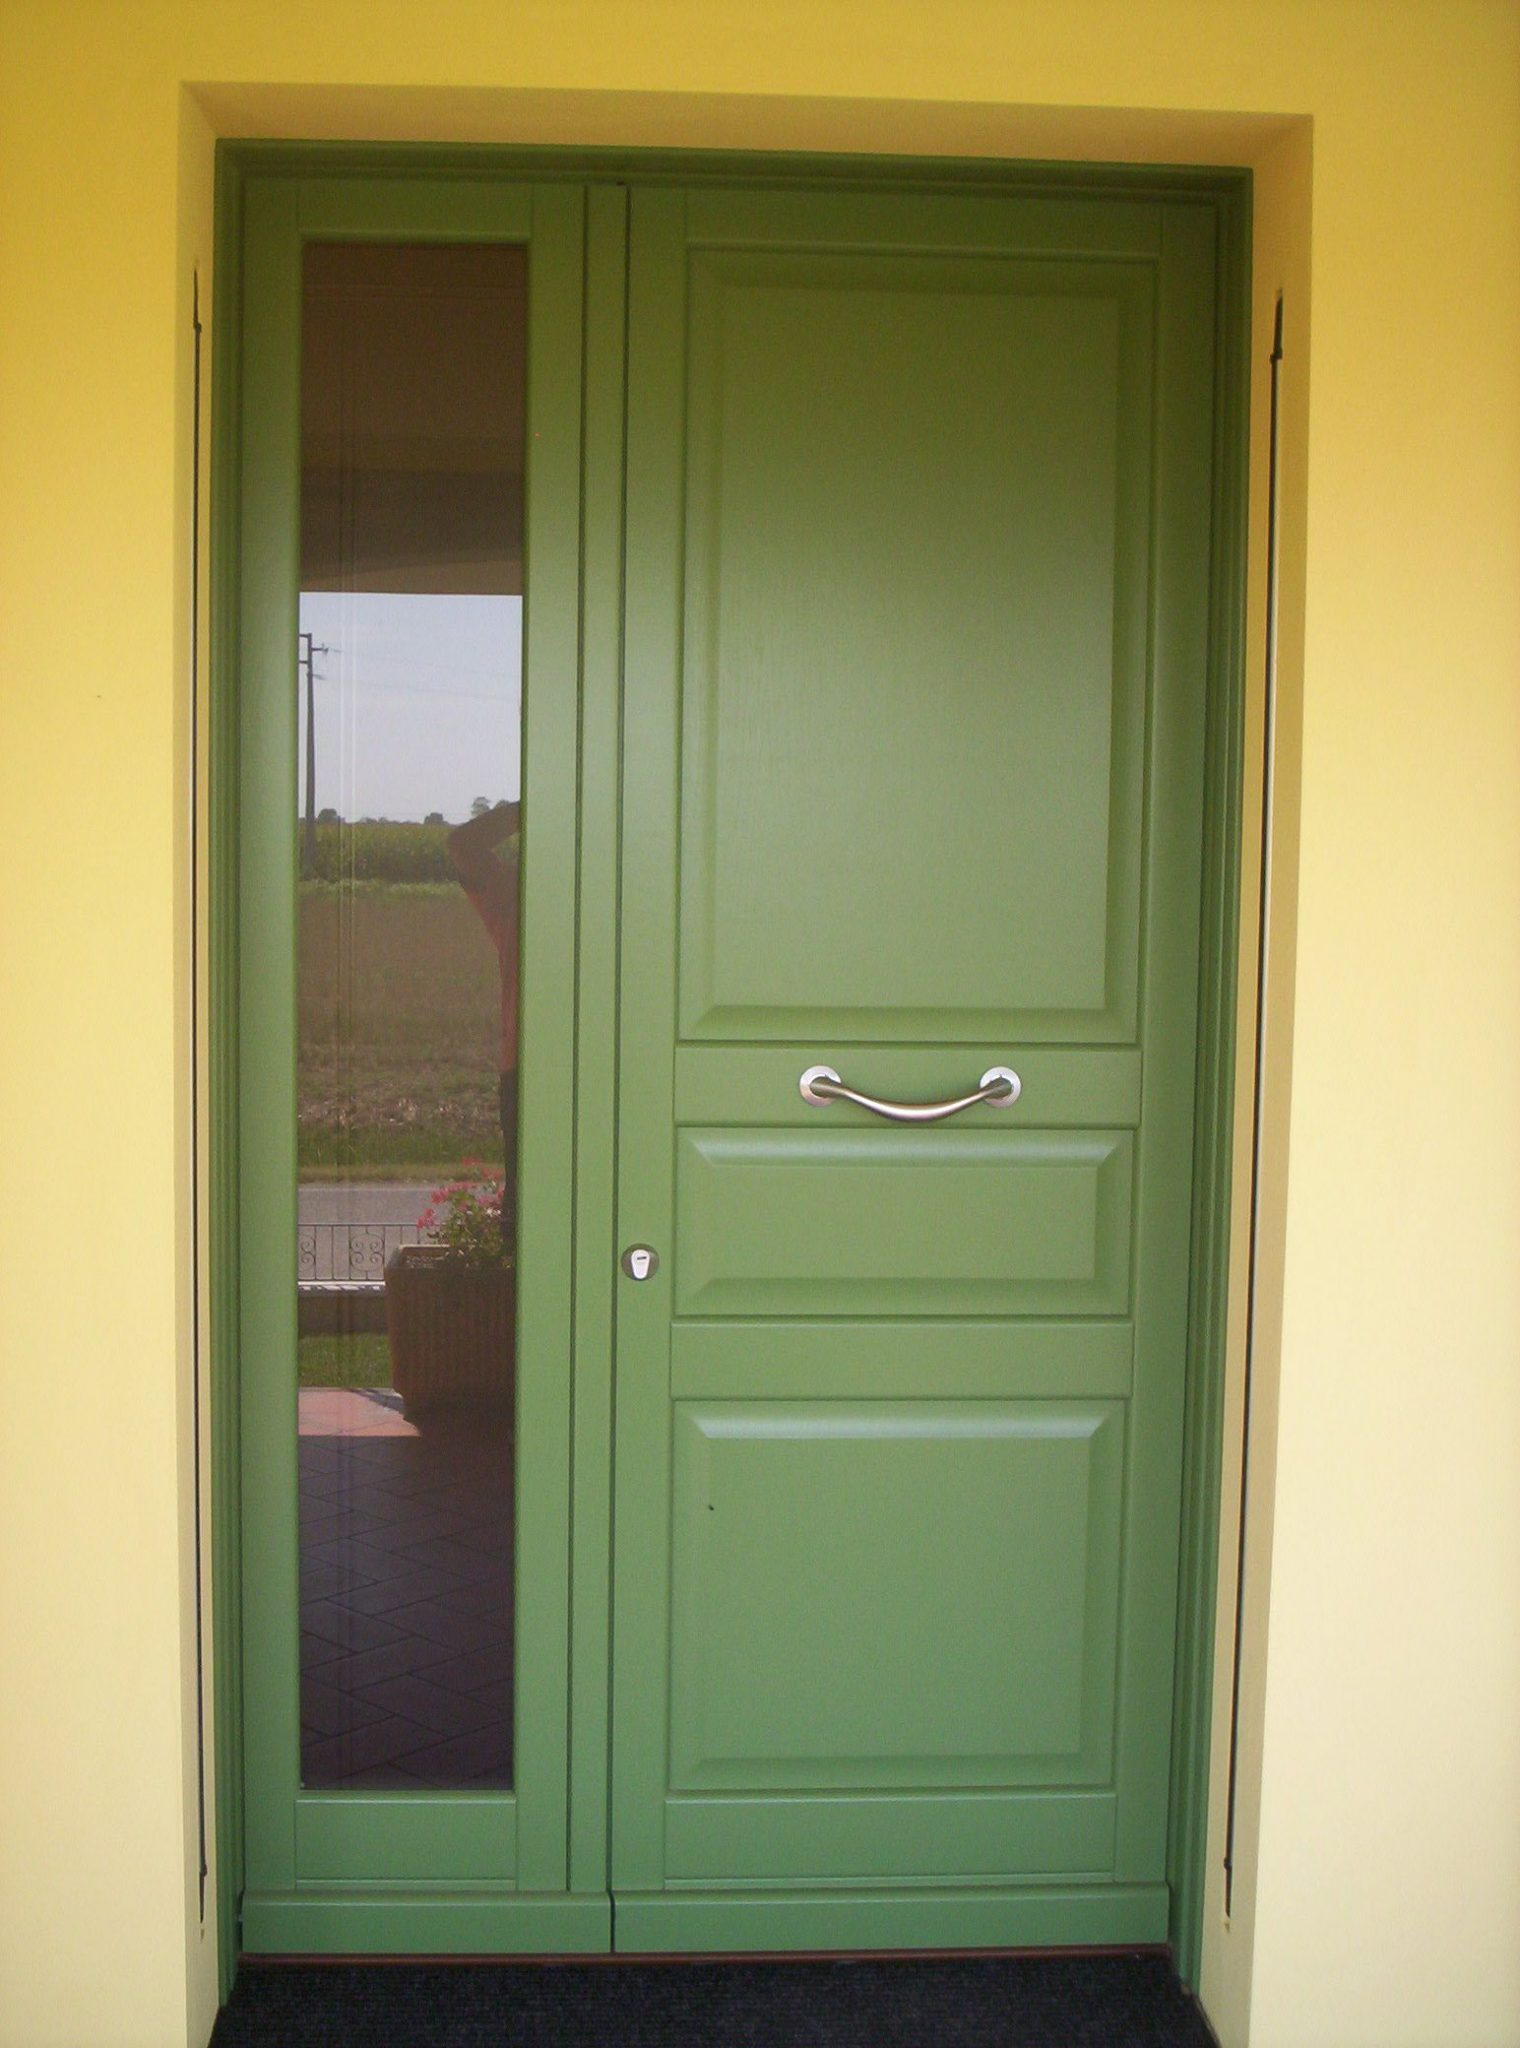 Porte d 39 ingresso in legno falegnameria pirondini for Porte d ingresso